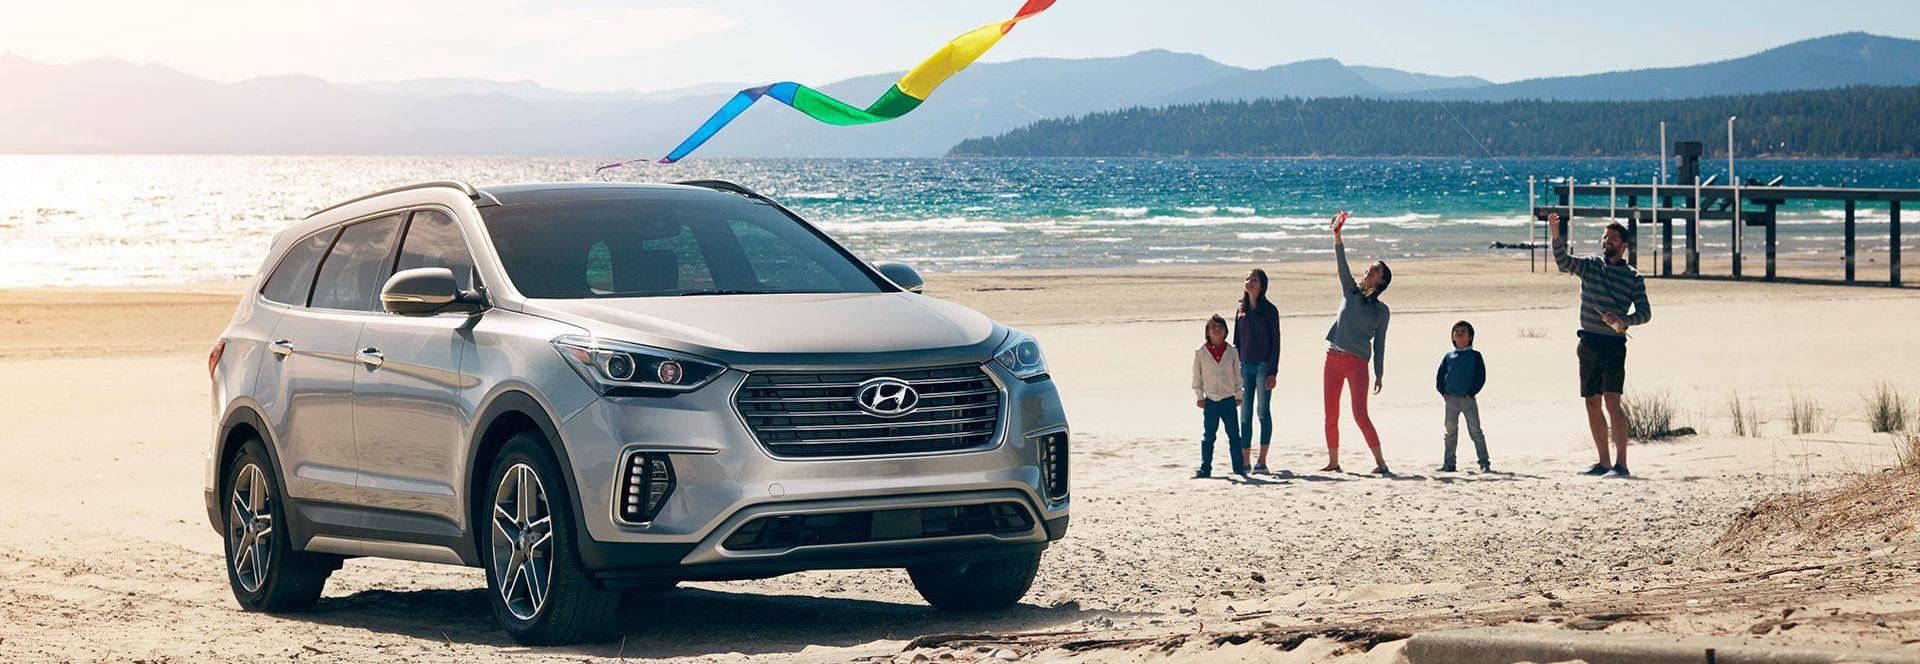 2019 Hyundai Santa Fe XL for Lease near Washington, DC